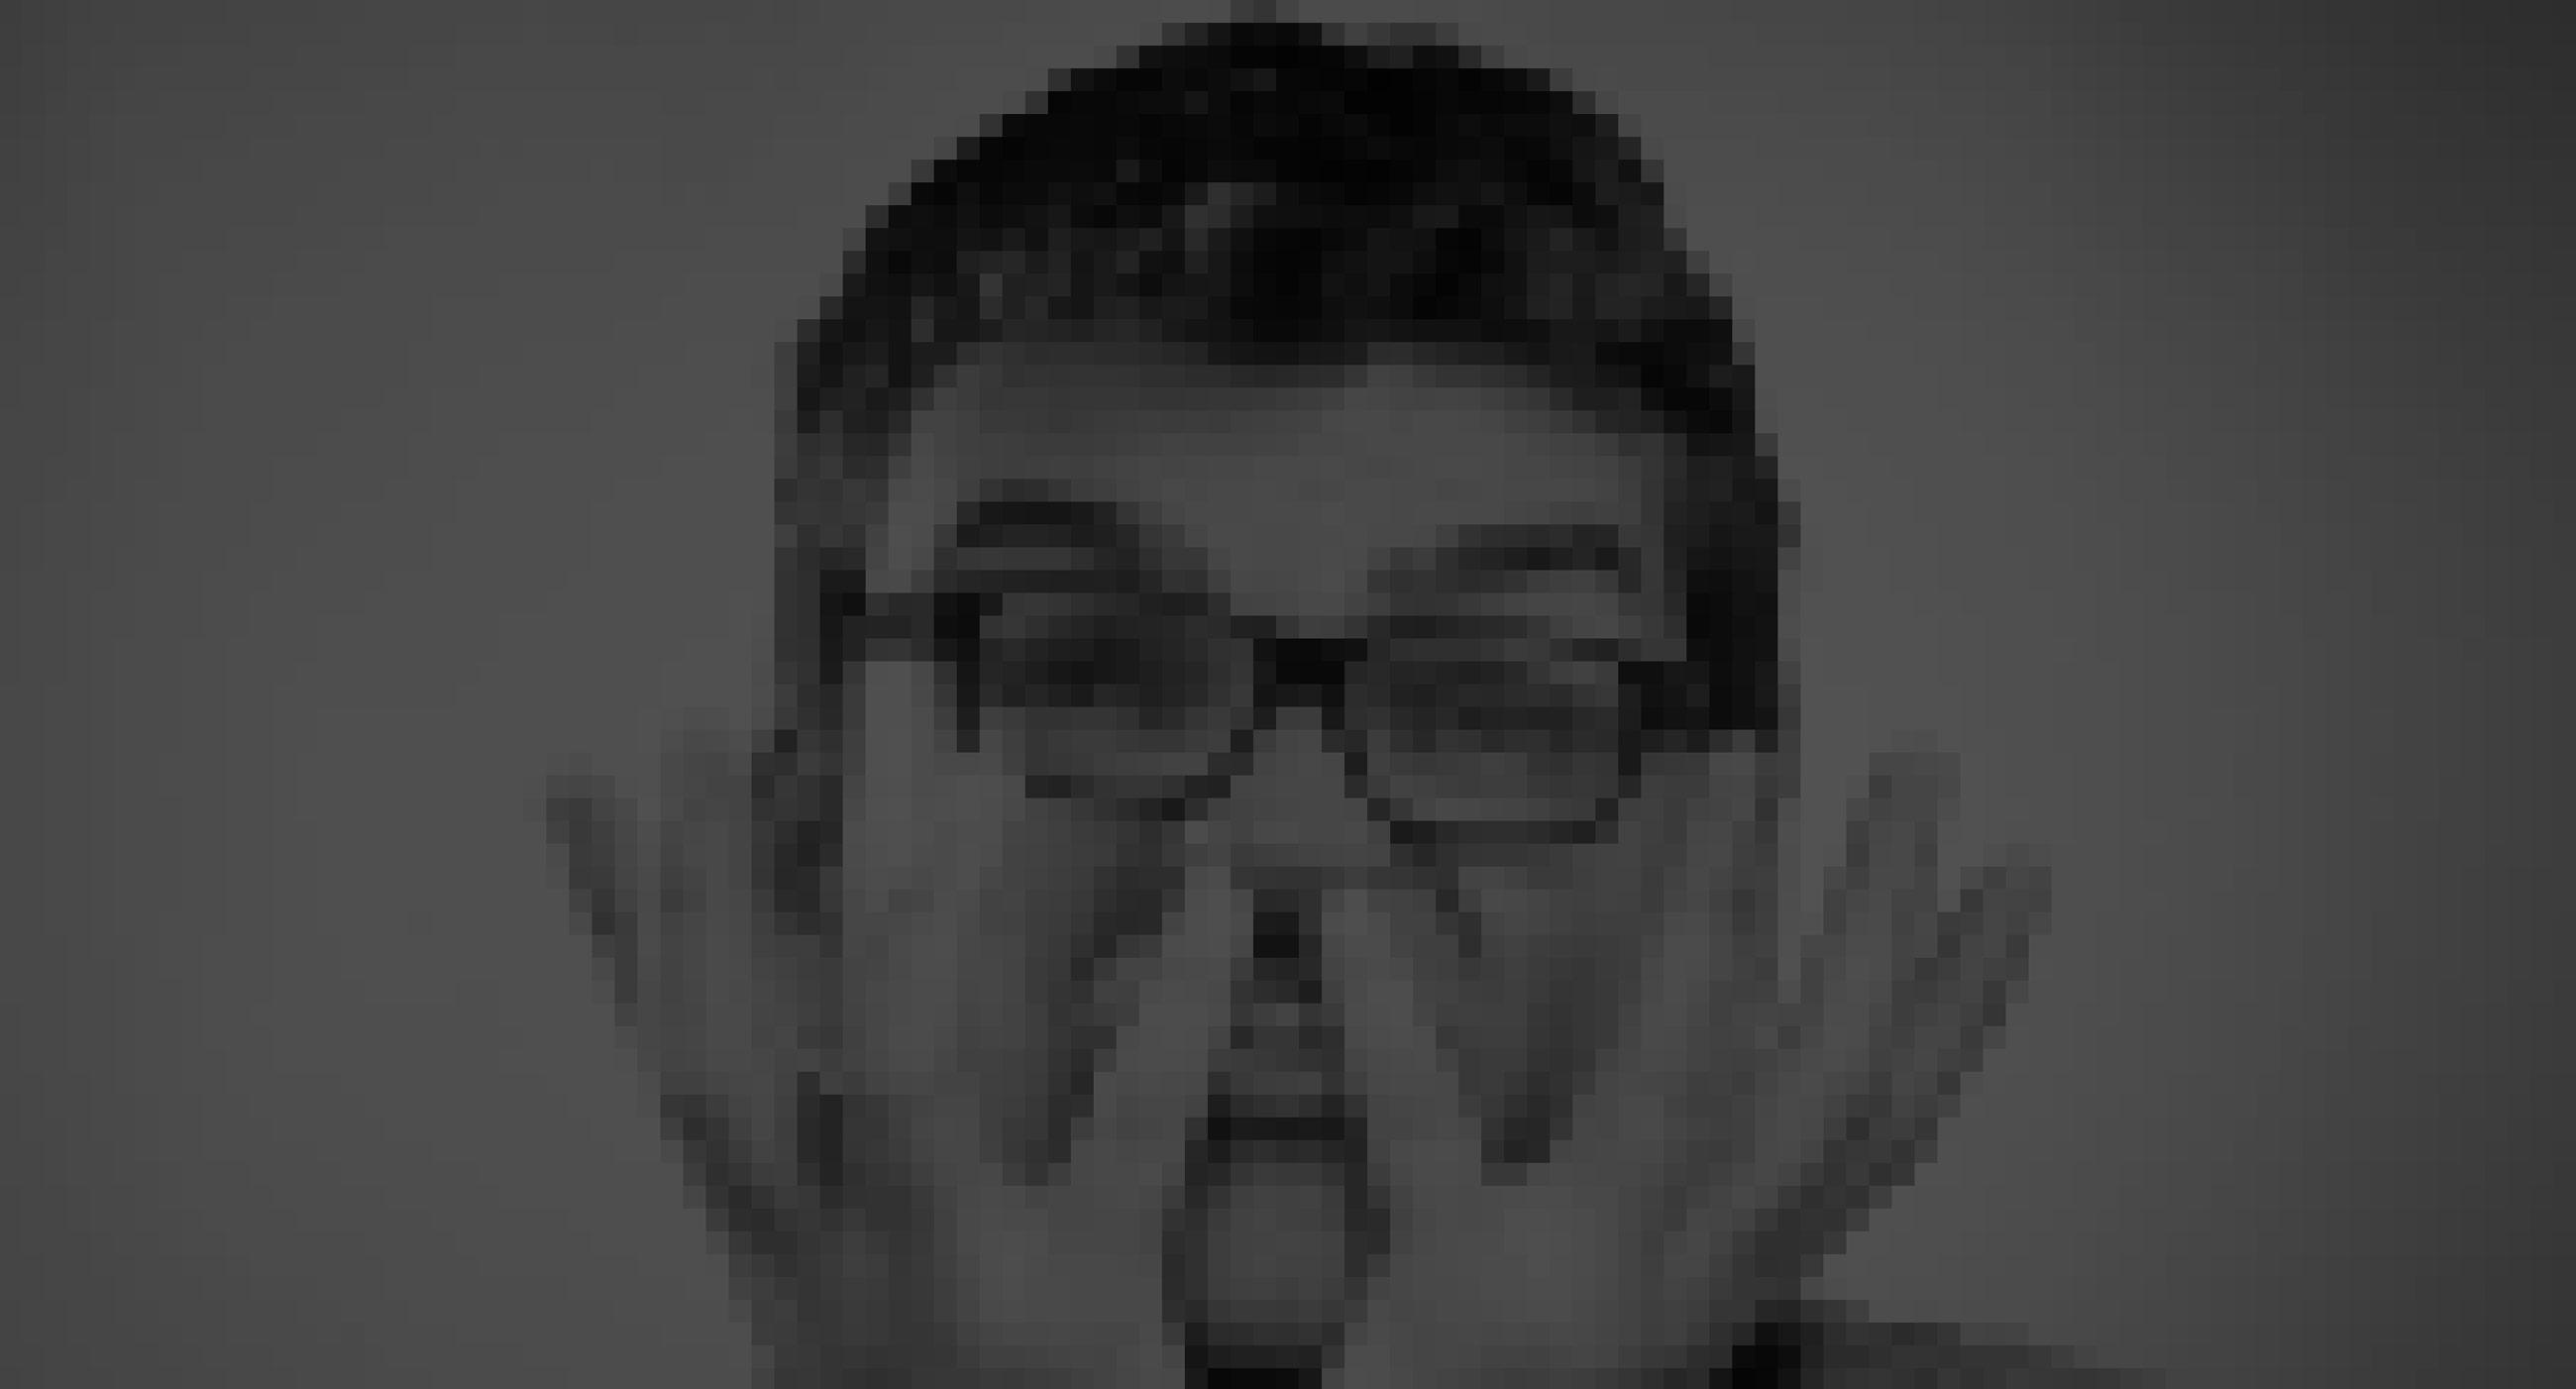 fotografía de persona pixelada